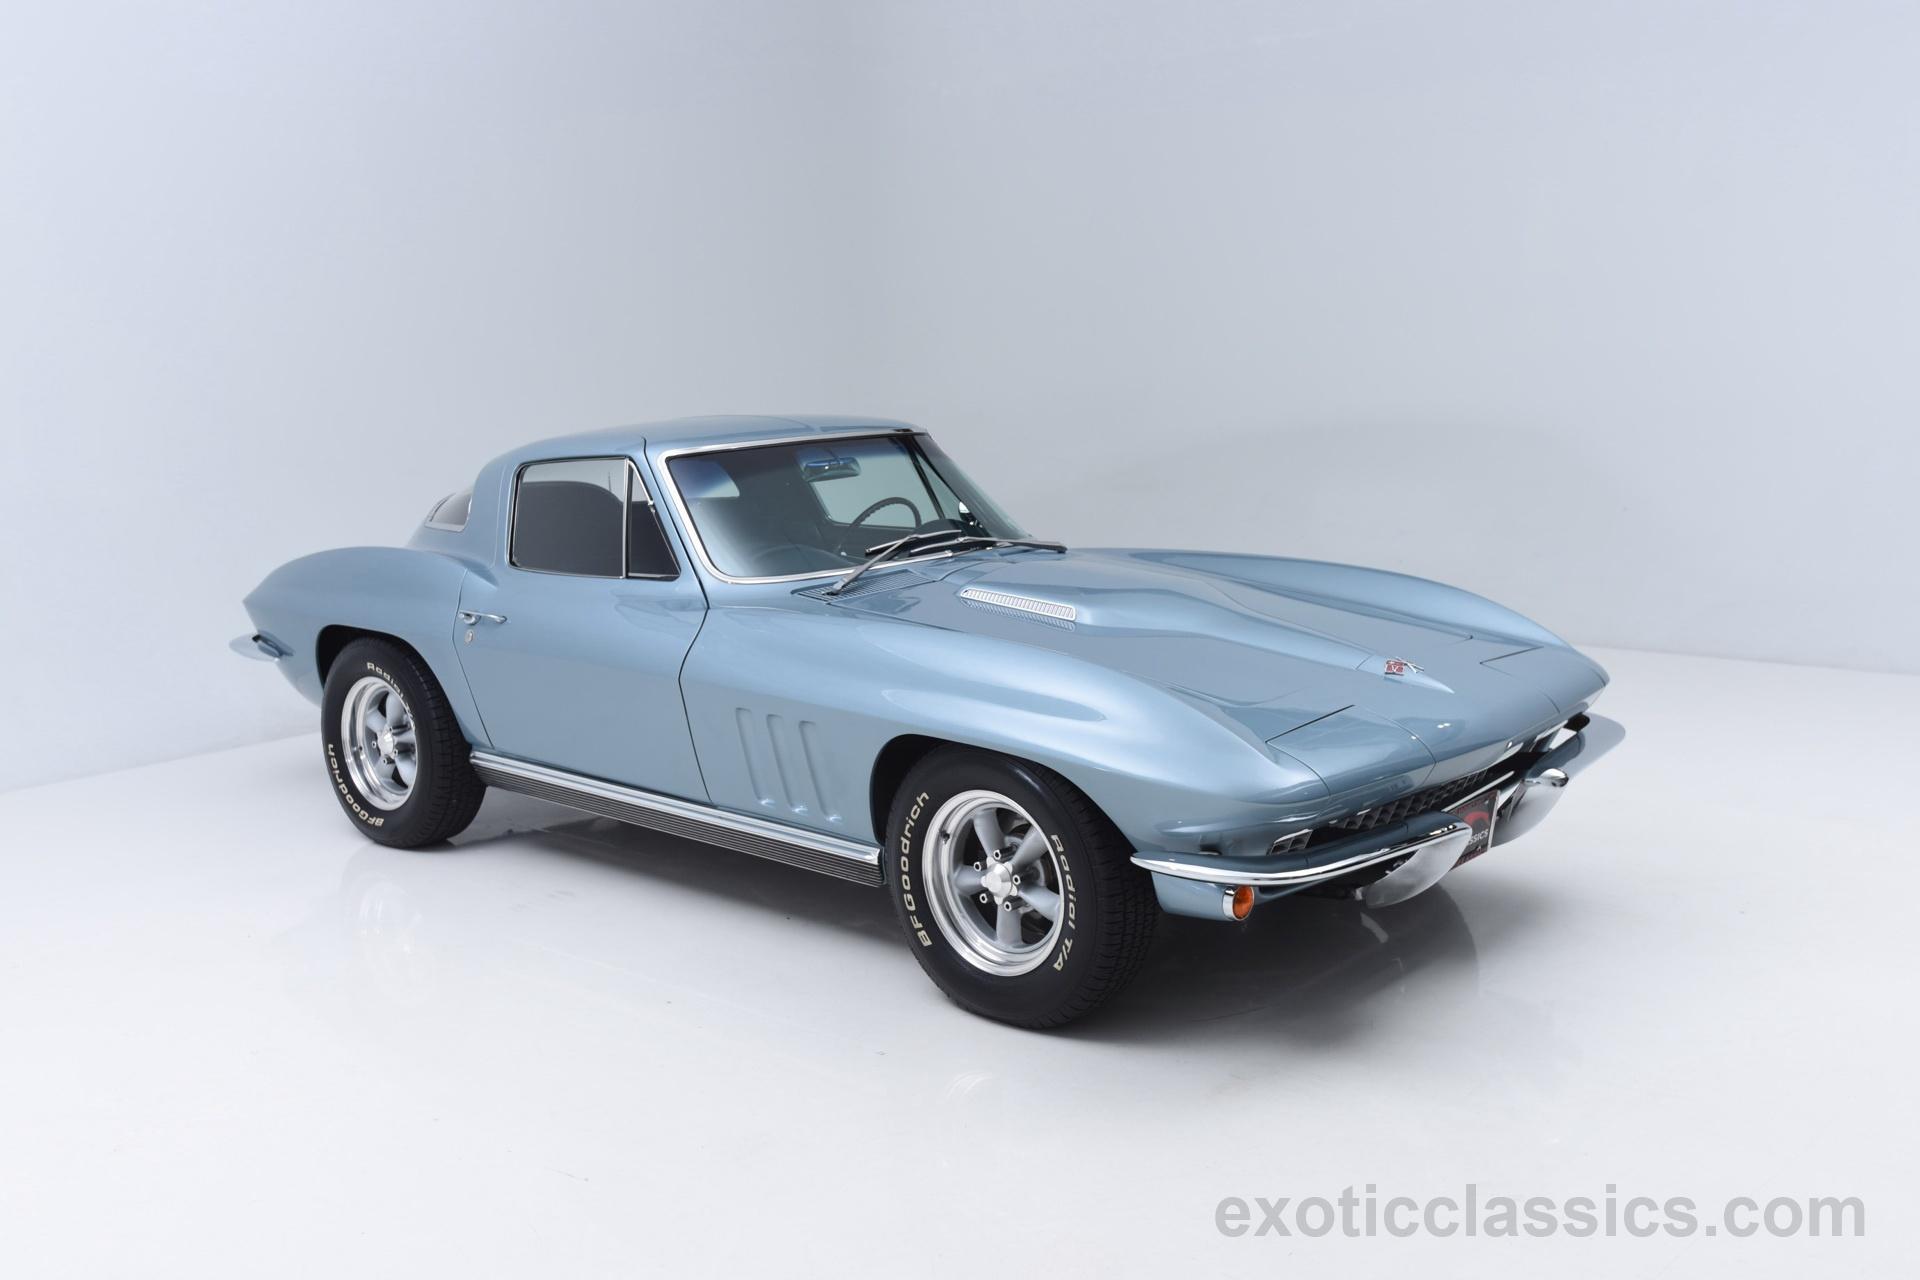 1966 Chevrolet Corvette Exotic Classic Car Dealership